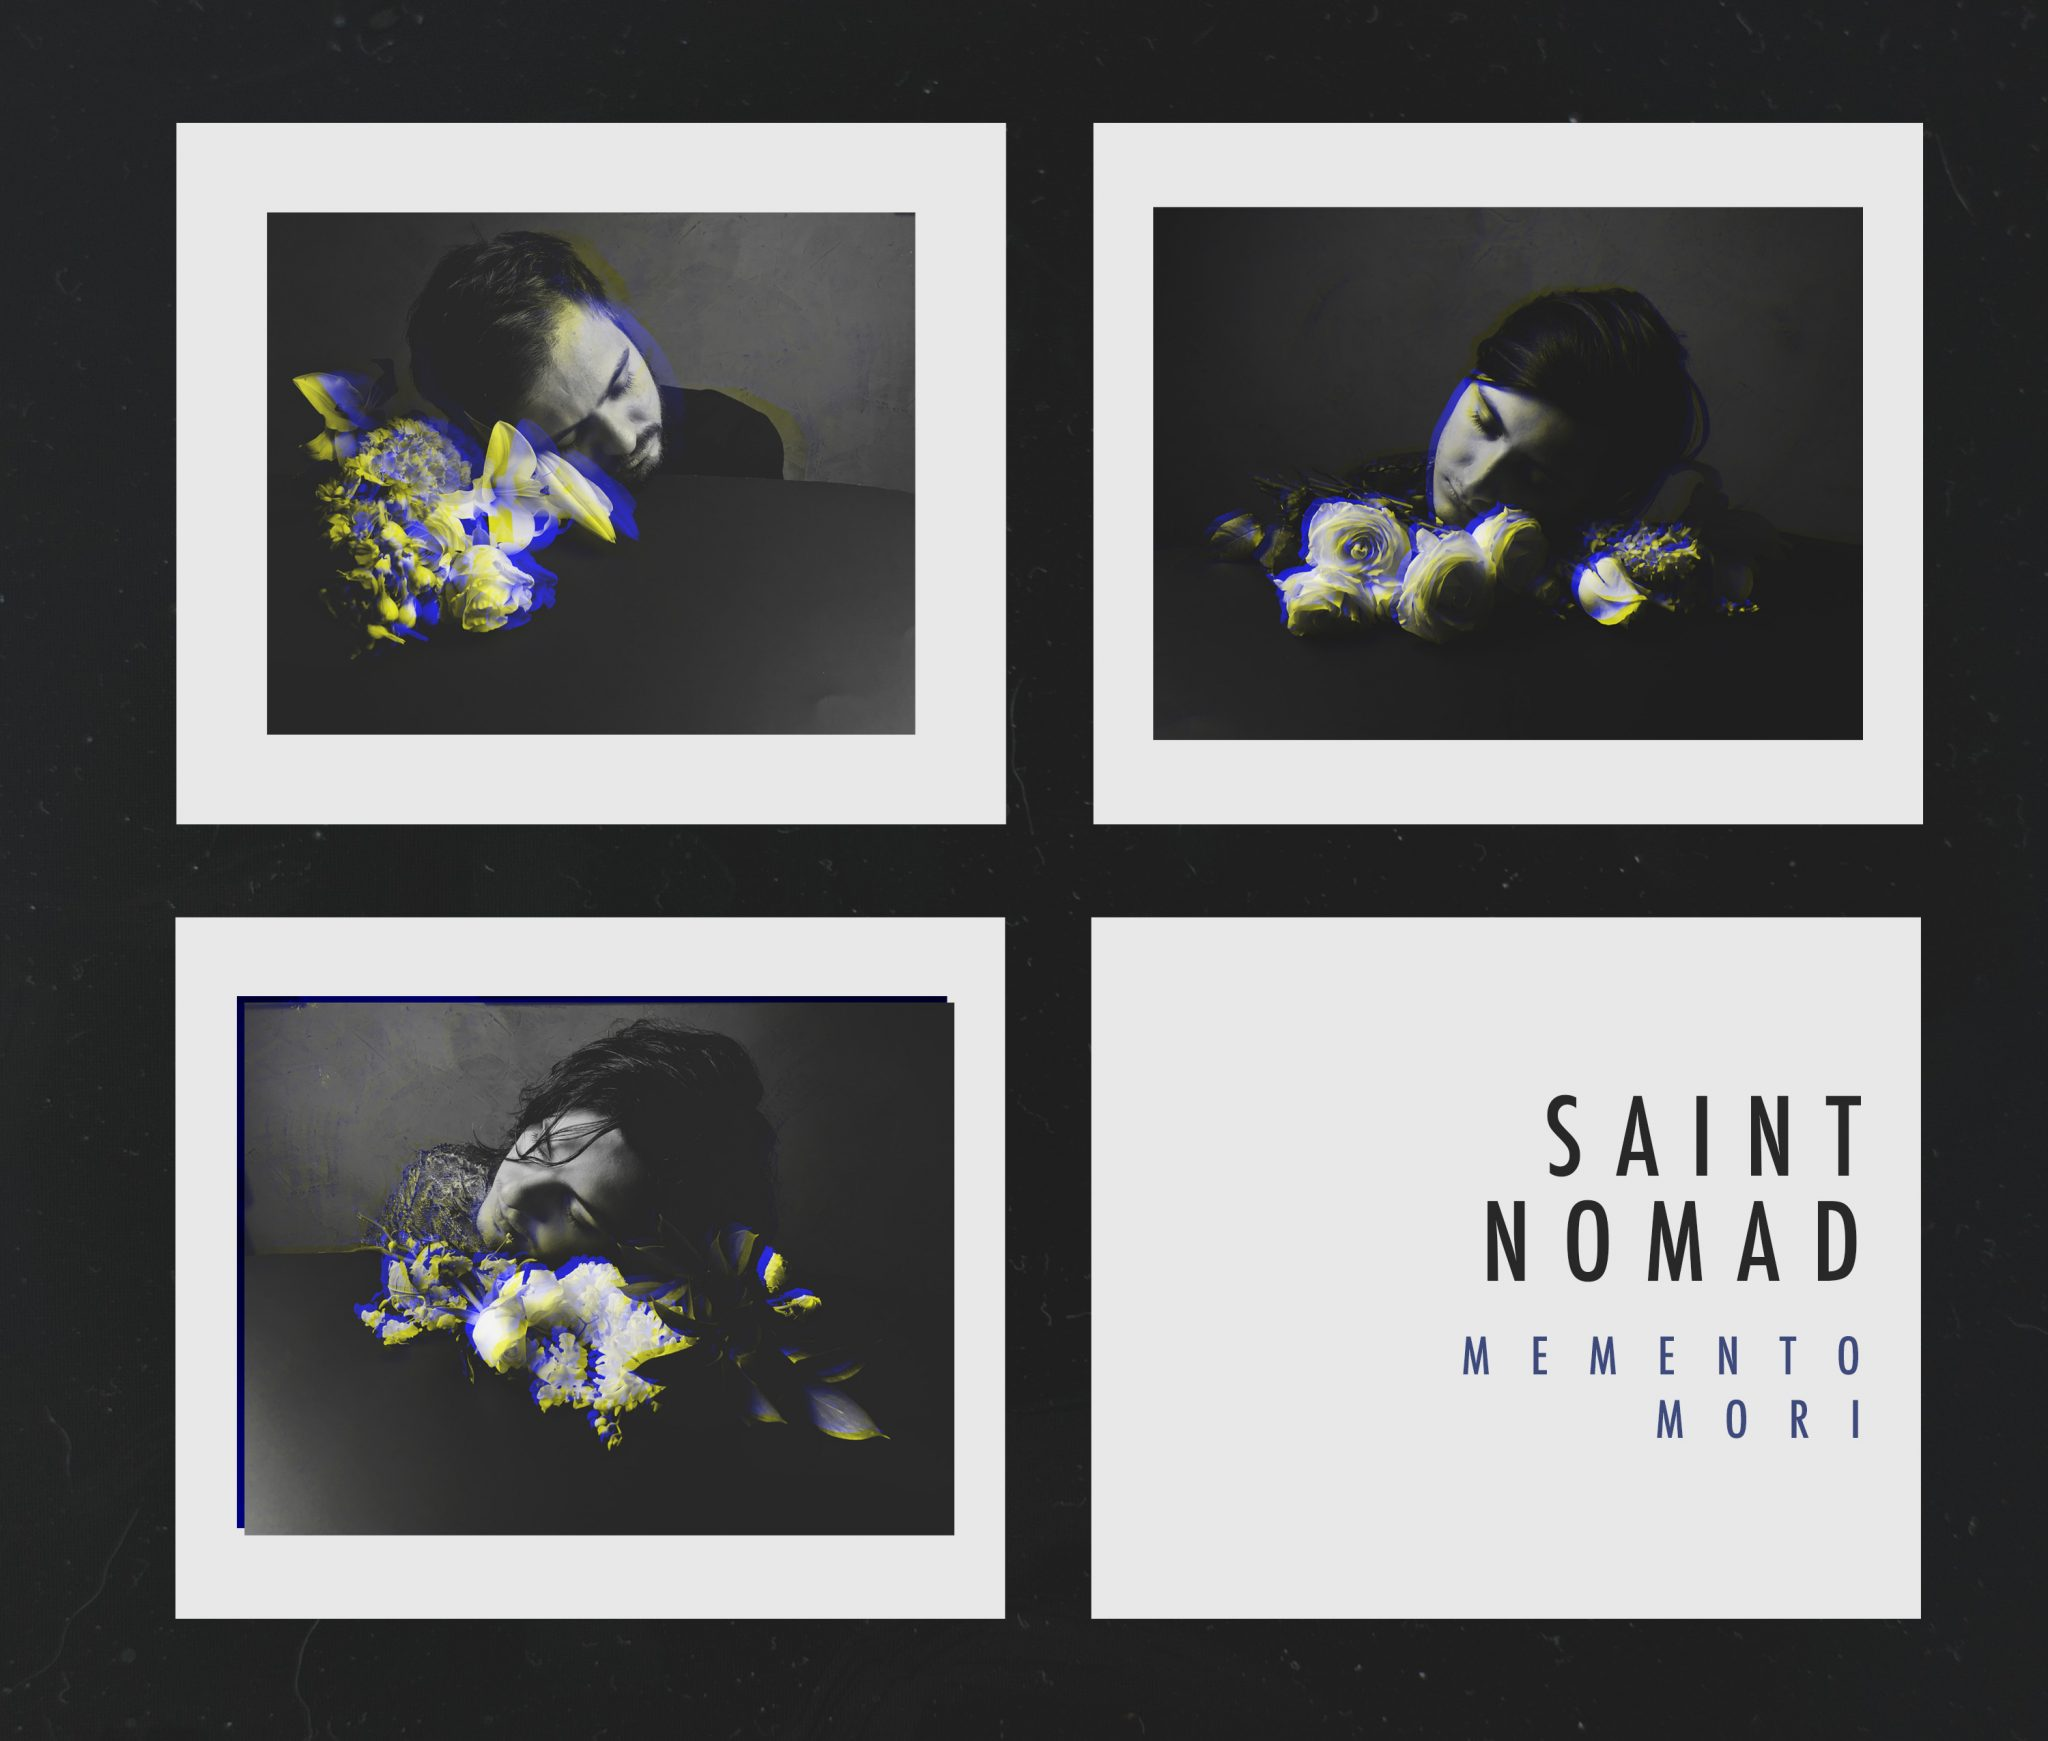 featured music video-el dorado-by-saint nomad-indie music-new music-indie rock-music blog-indie blog-wolf in a suit-wolfinasuit-wolf in a suit blog-wolf in a suit music blog